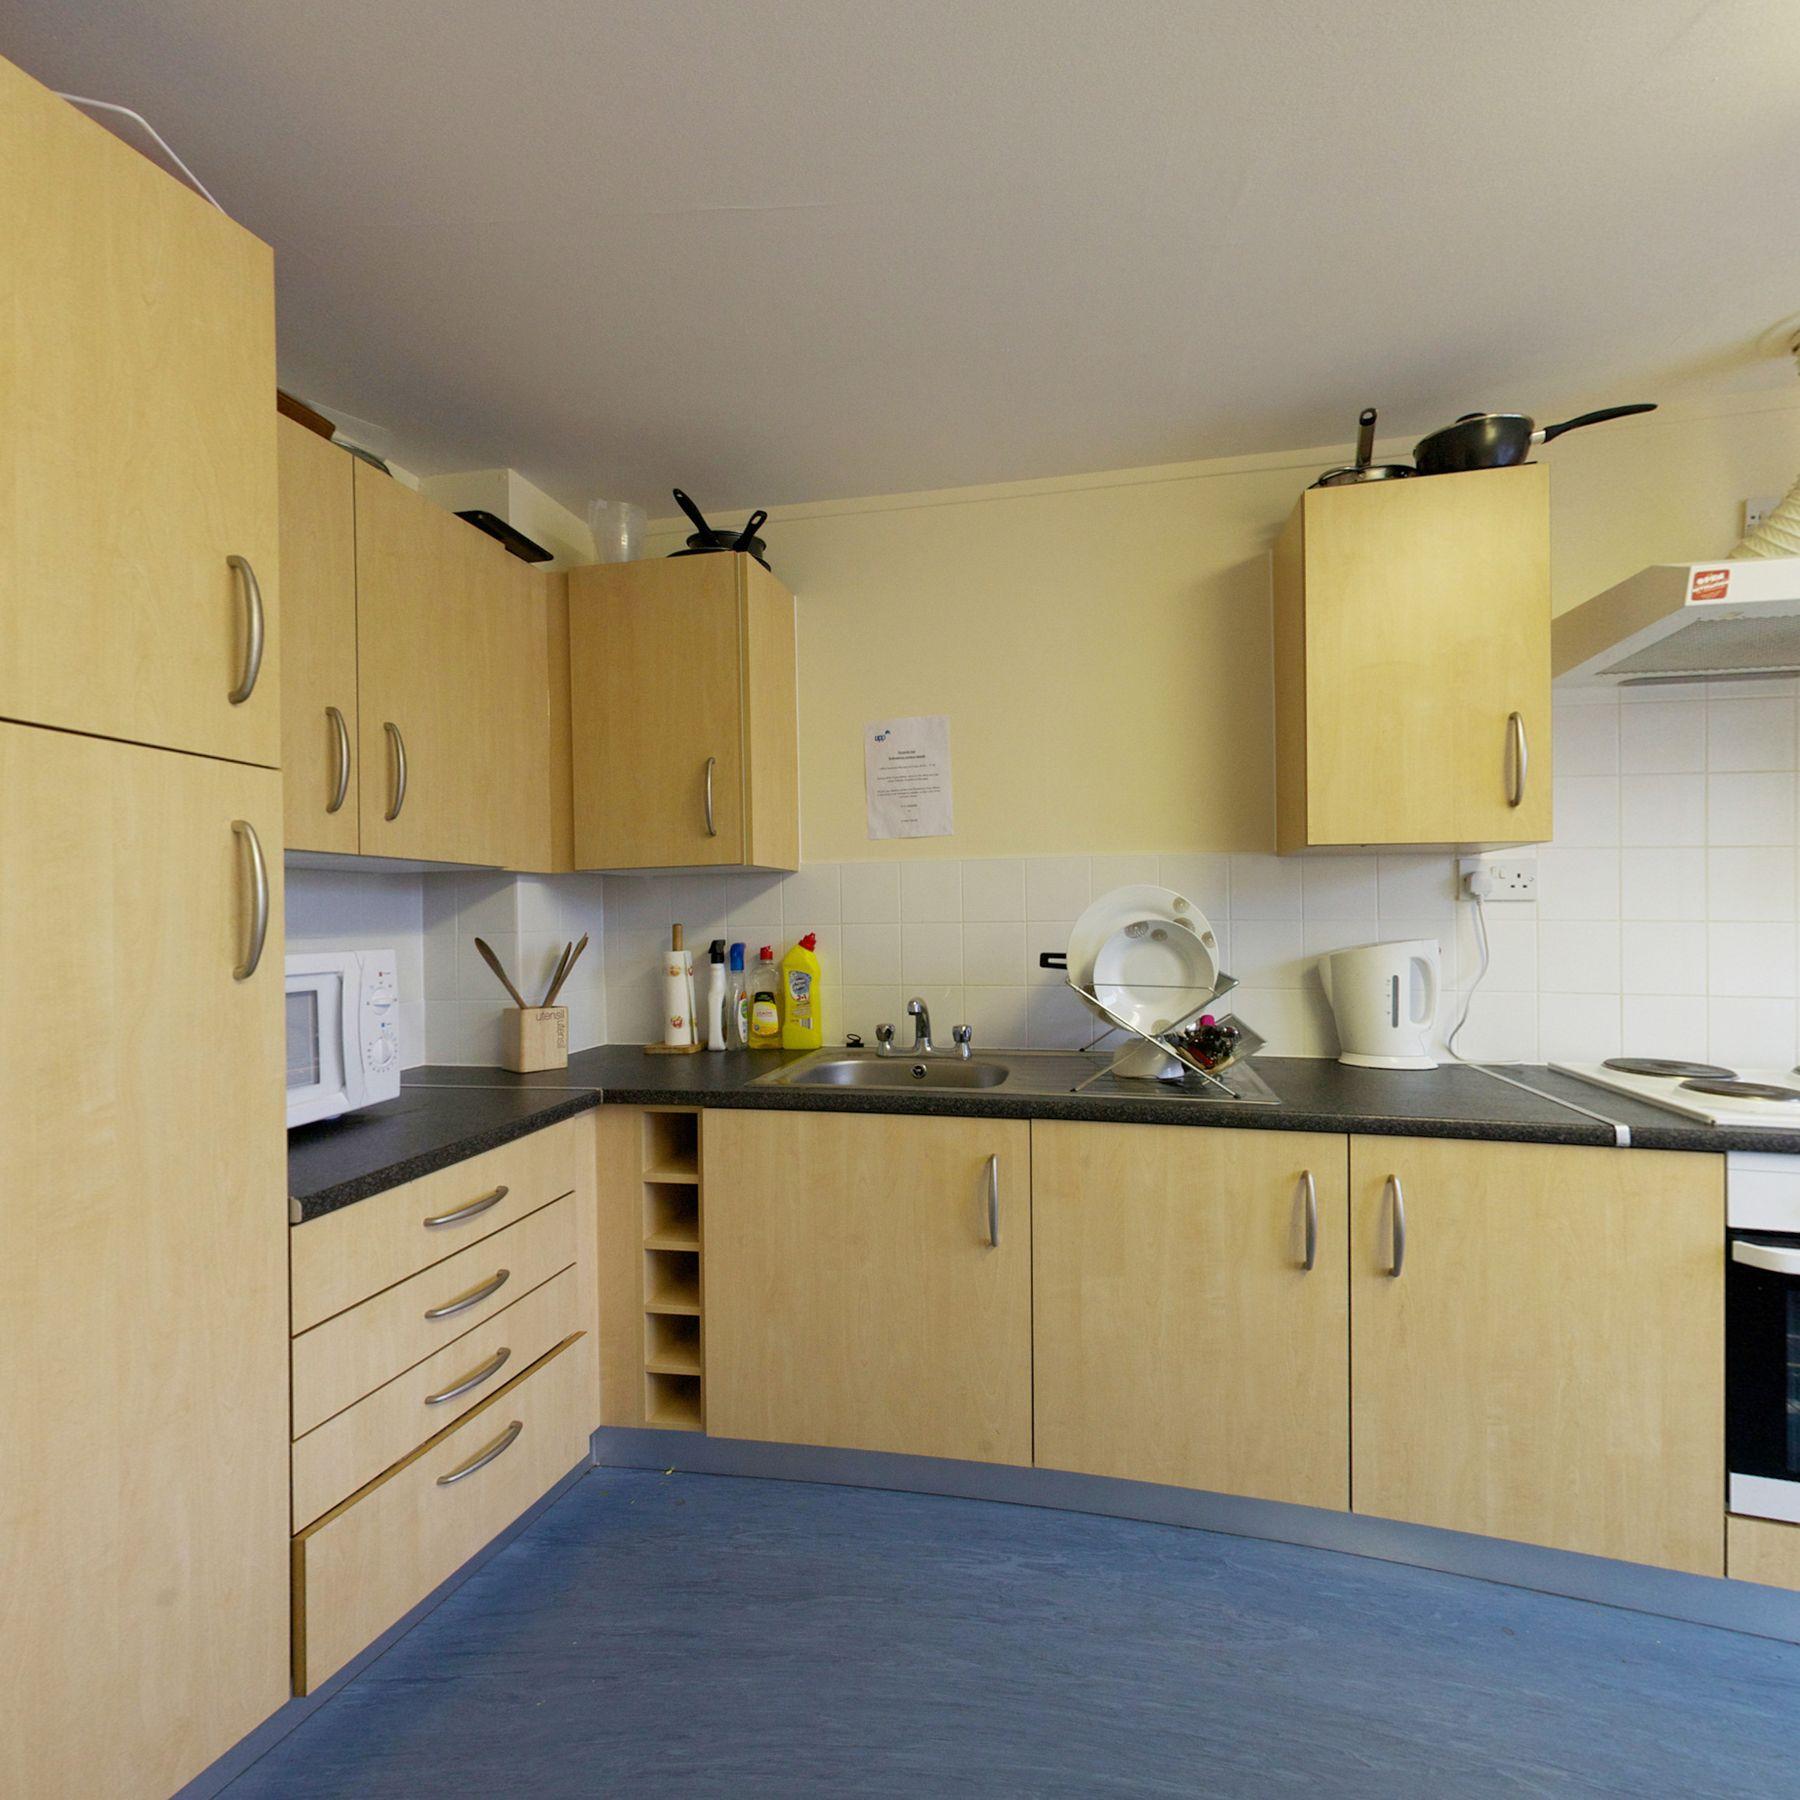 Peverell kitchen